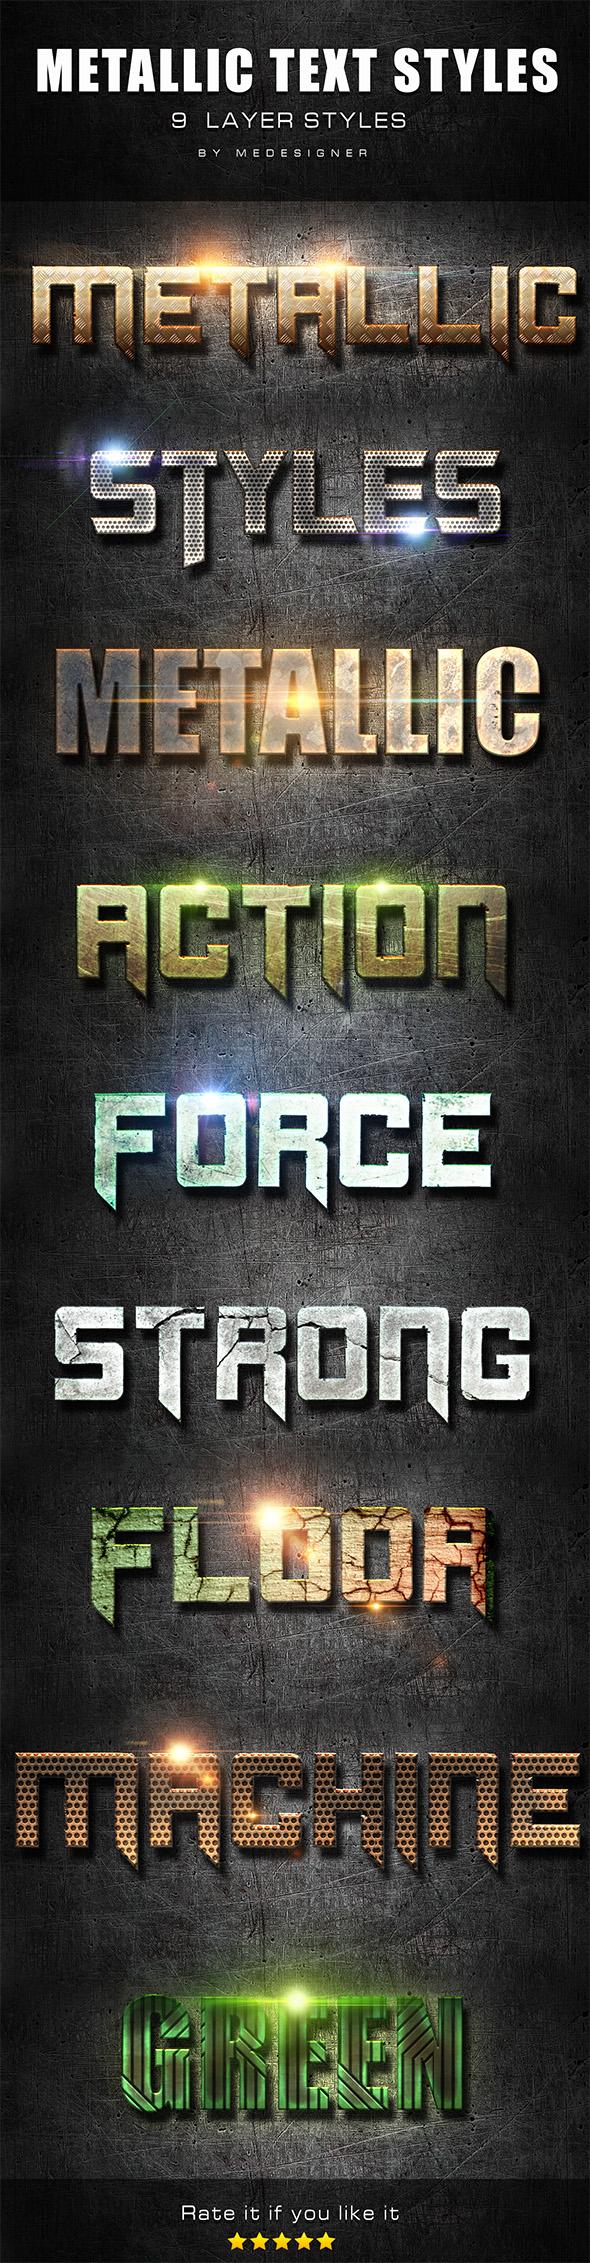 Metallic Text Styles V.4 - Text Effects Styles